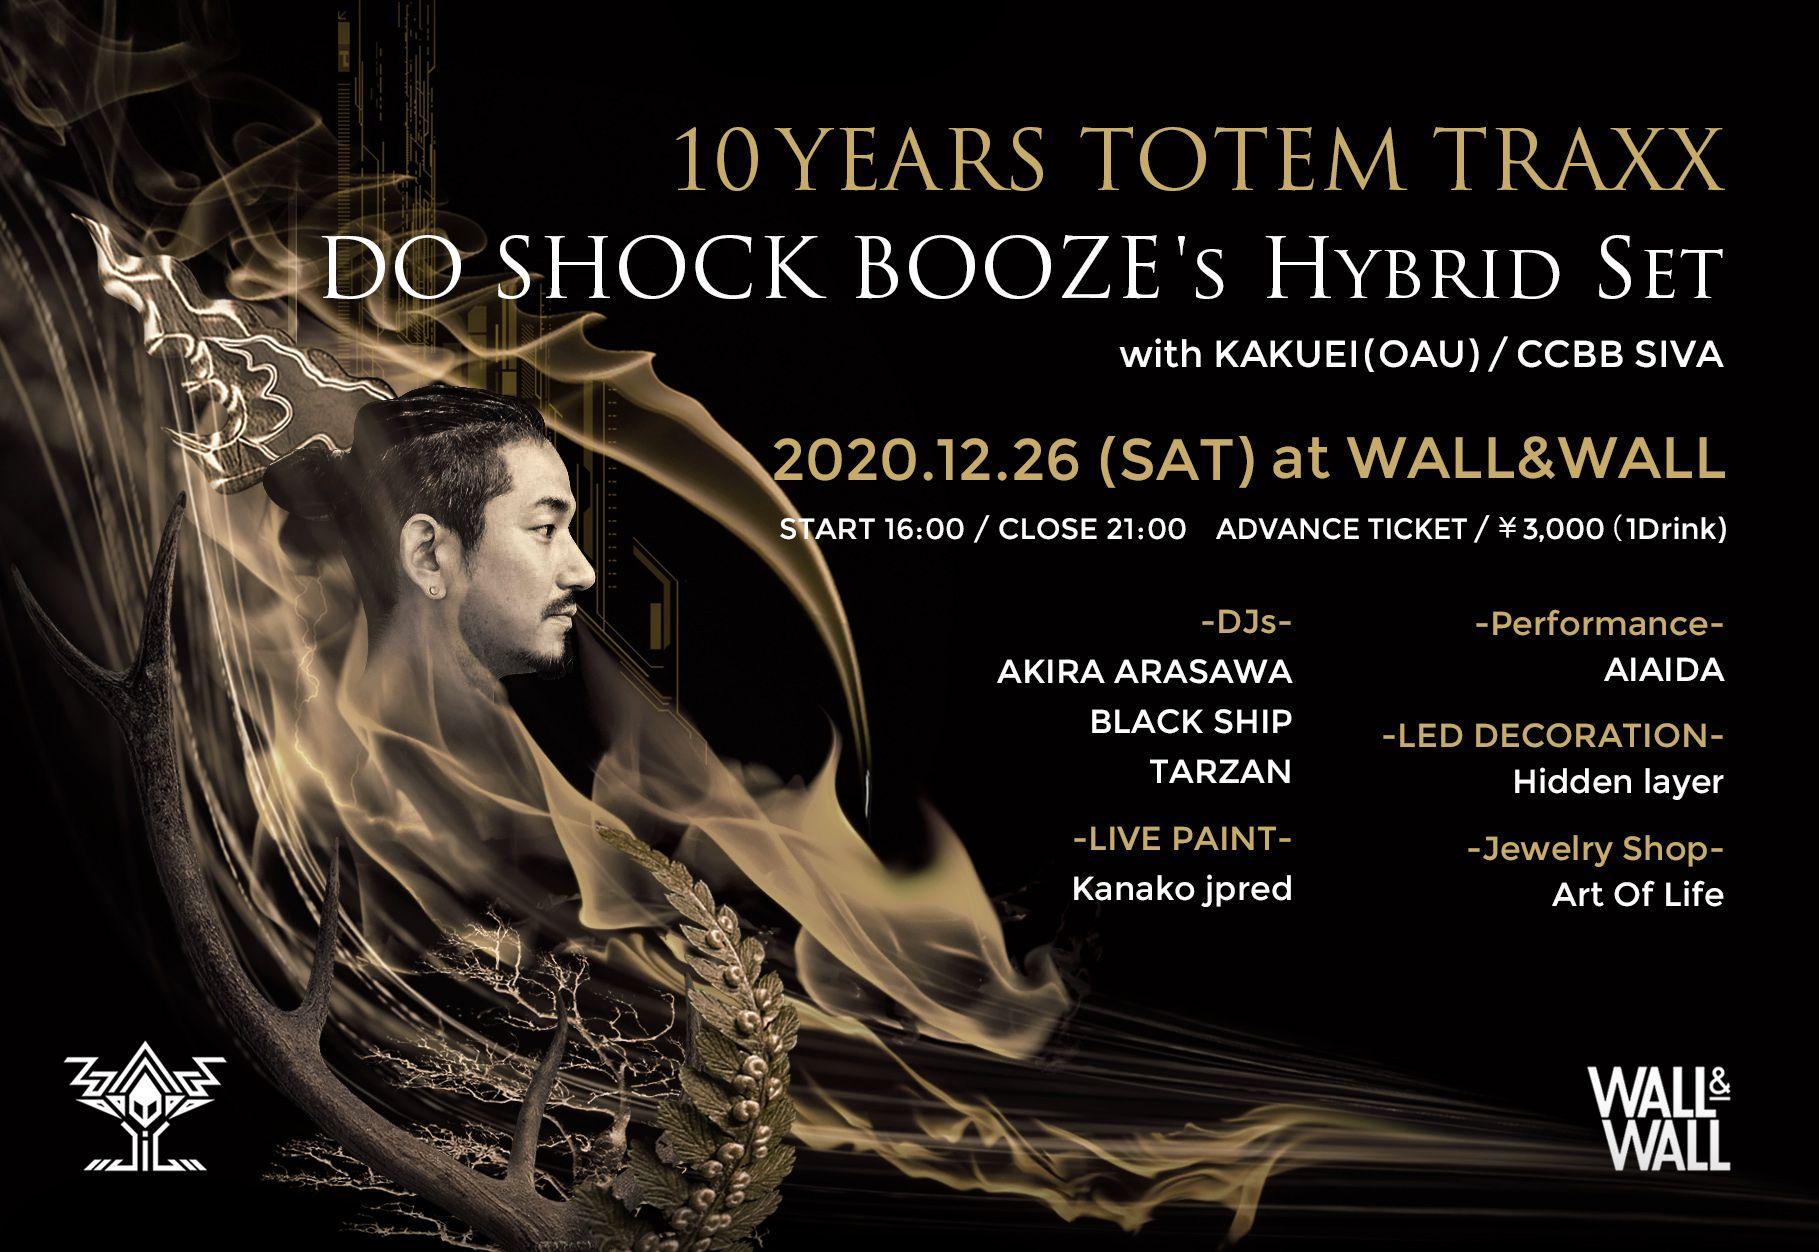 10 Years TOTEM TRAXX